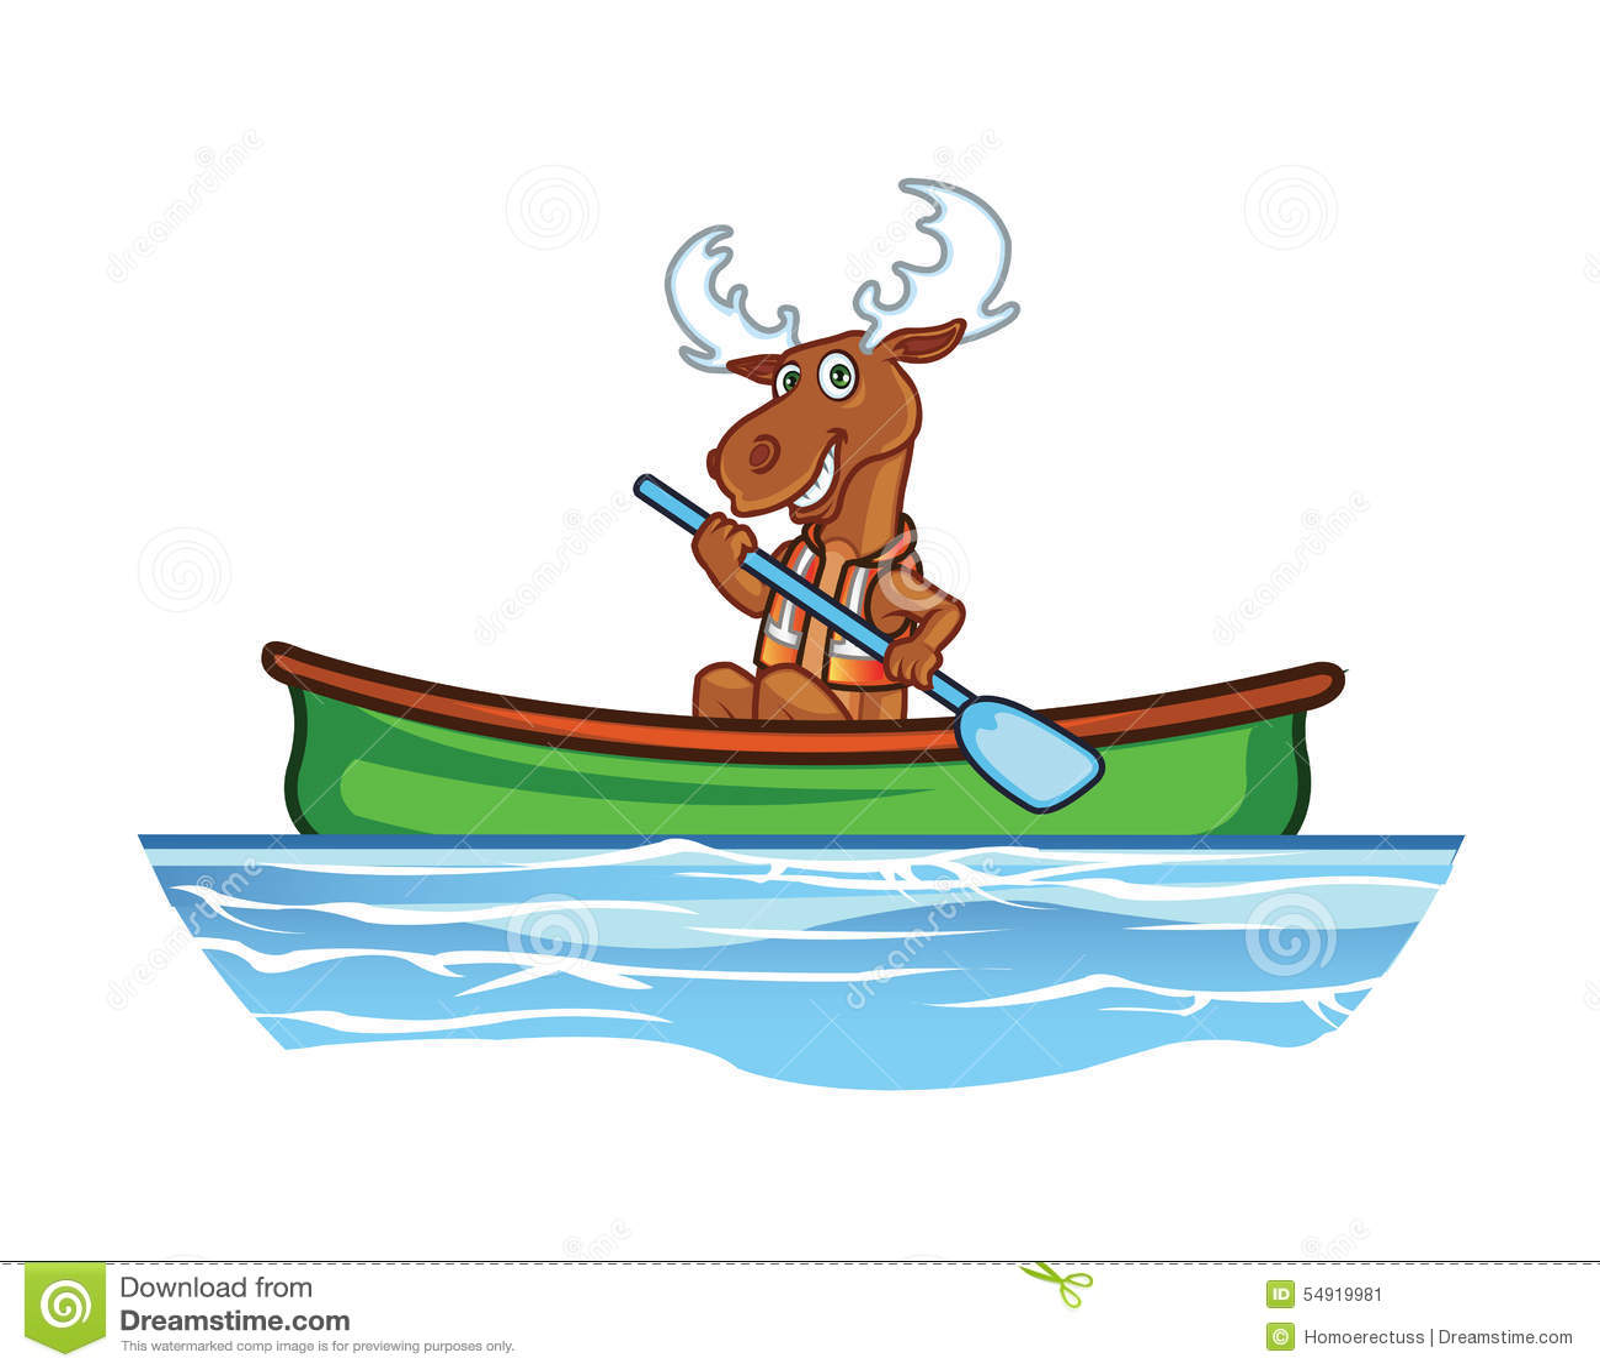 Moose in Canoe Cartoon stock vector. Illustration of ...